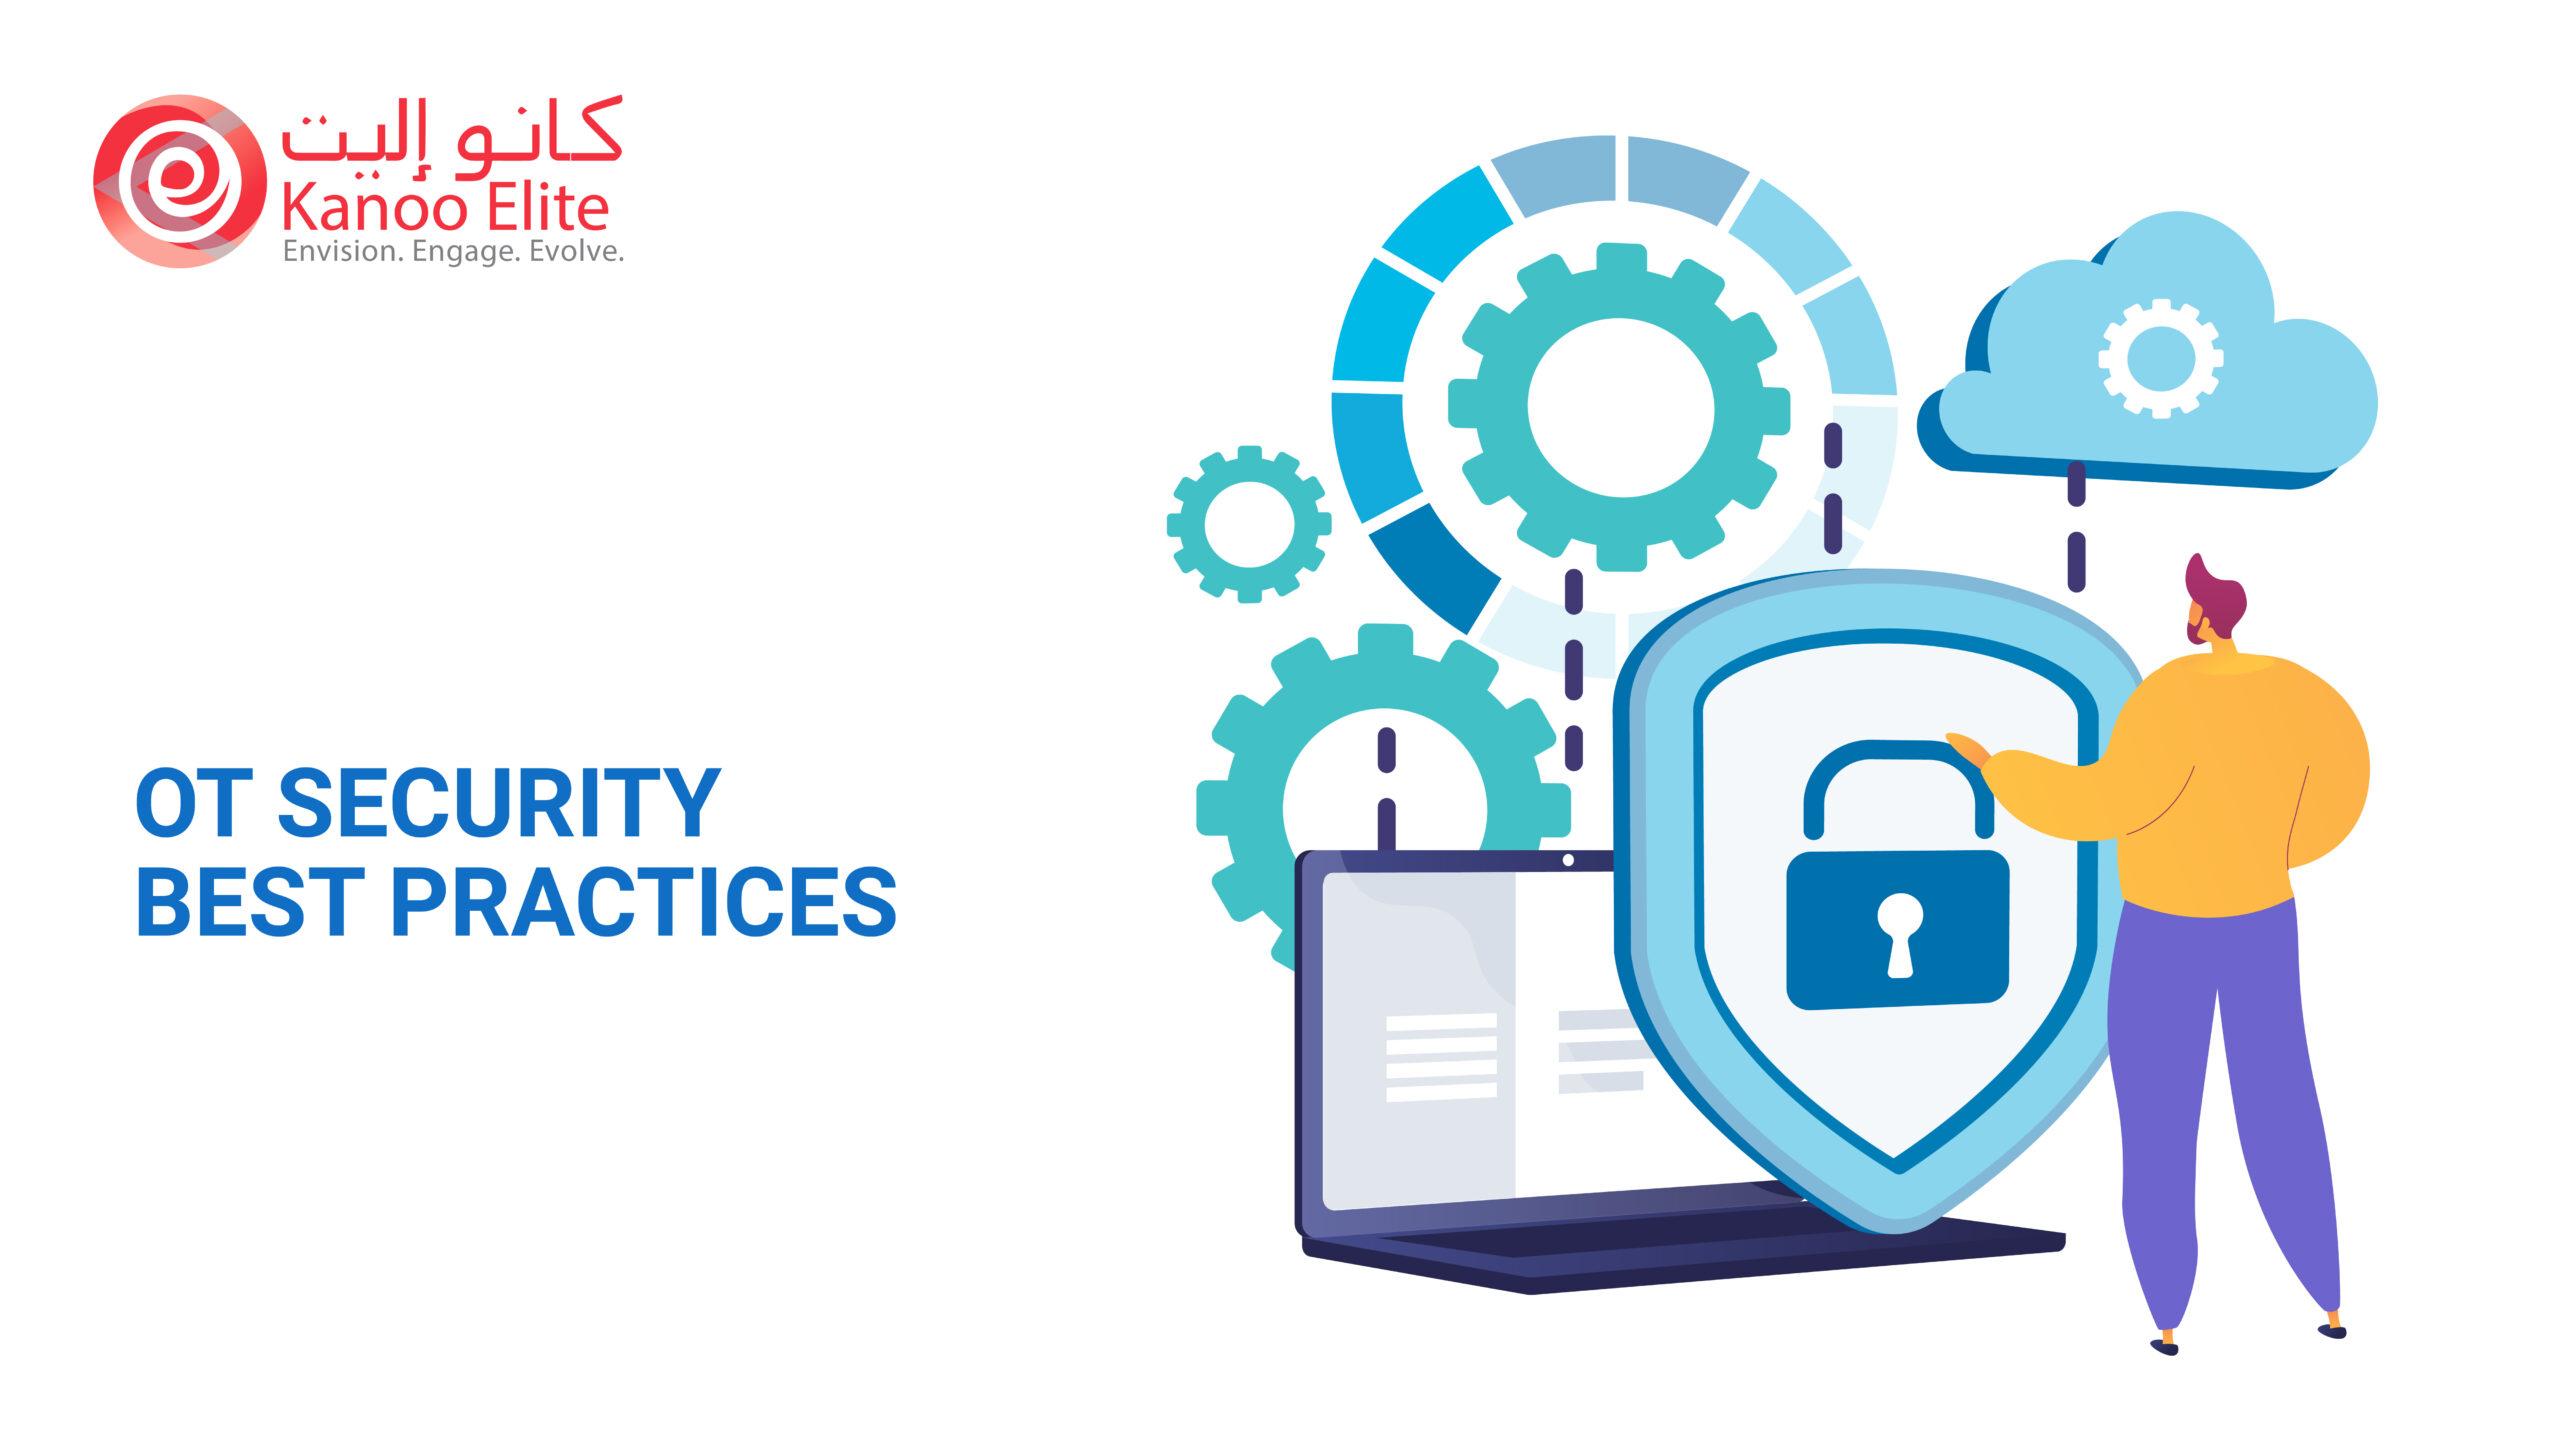 OT Security Best Practices